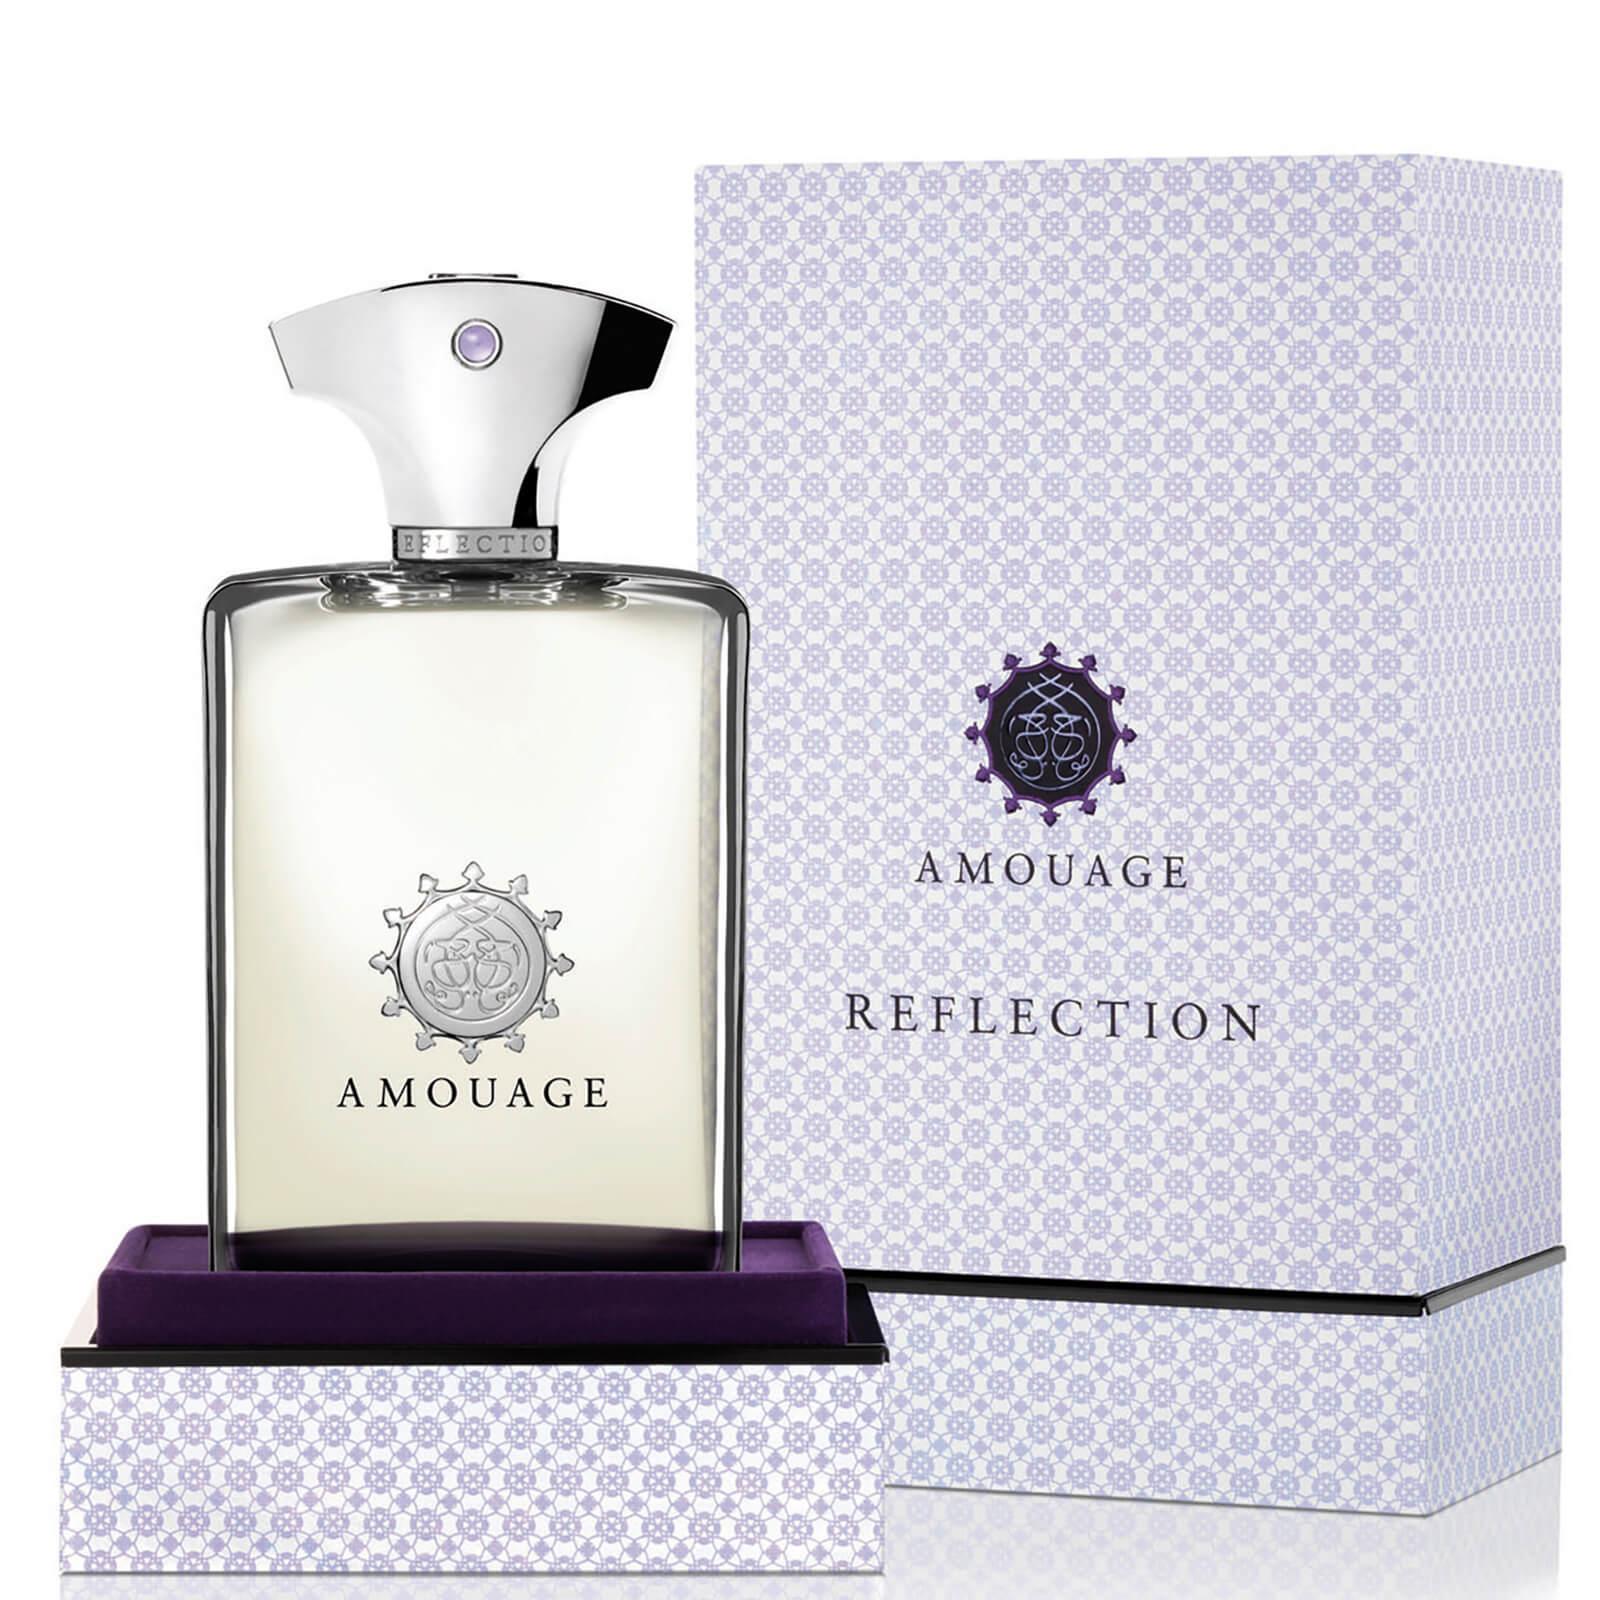 Amouage Reflection Man Eau De Parfum 100ml Free Shipping